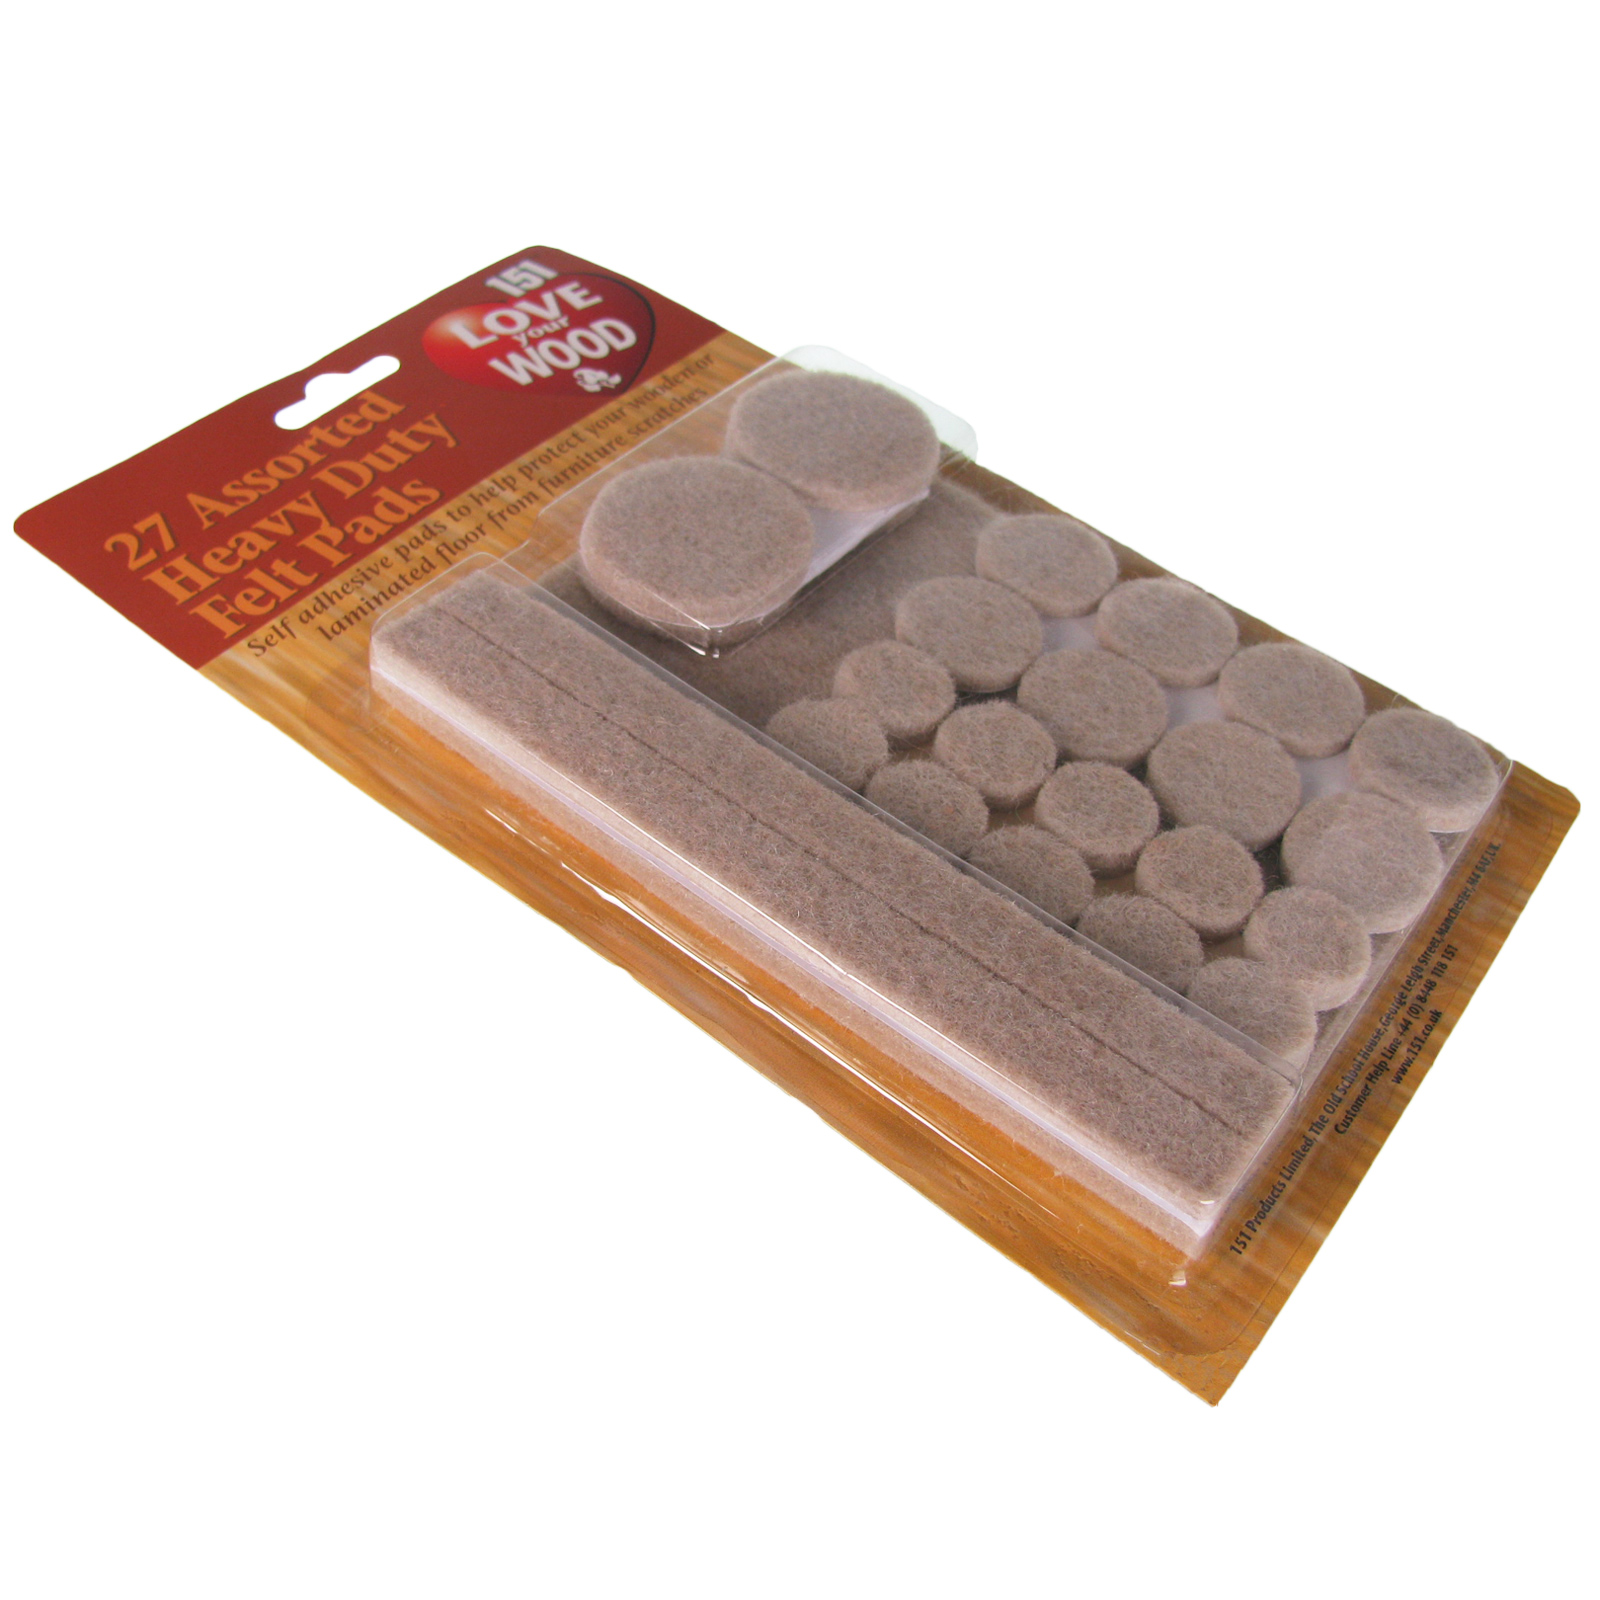 Furniture Felt Pads Floor Protector Wood Adhesive Laminate Heavy Duty ...